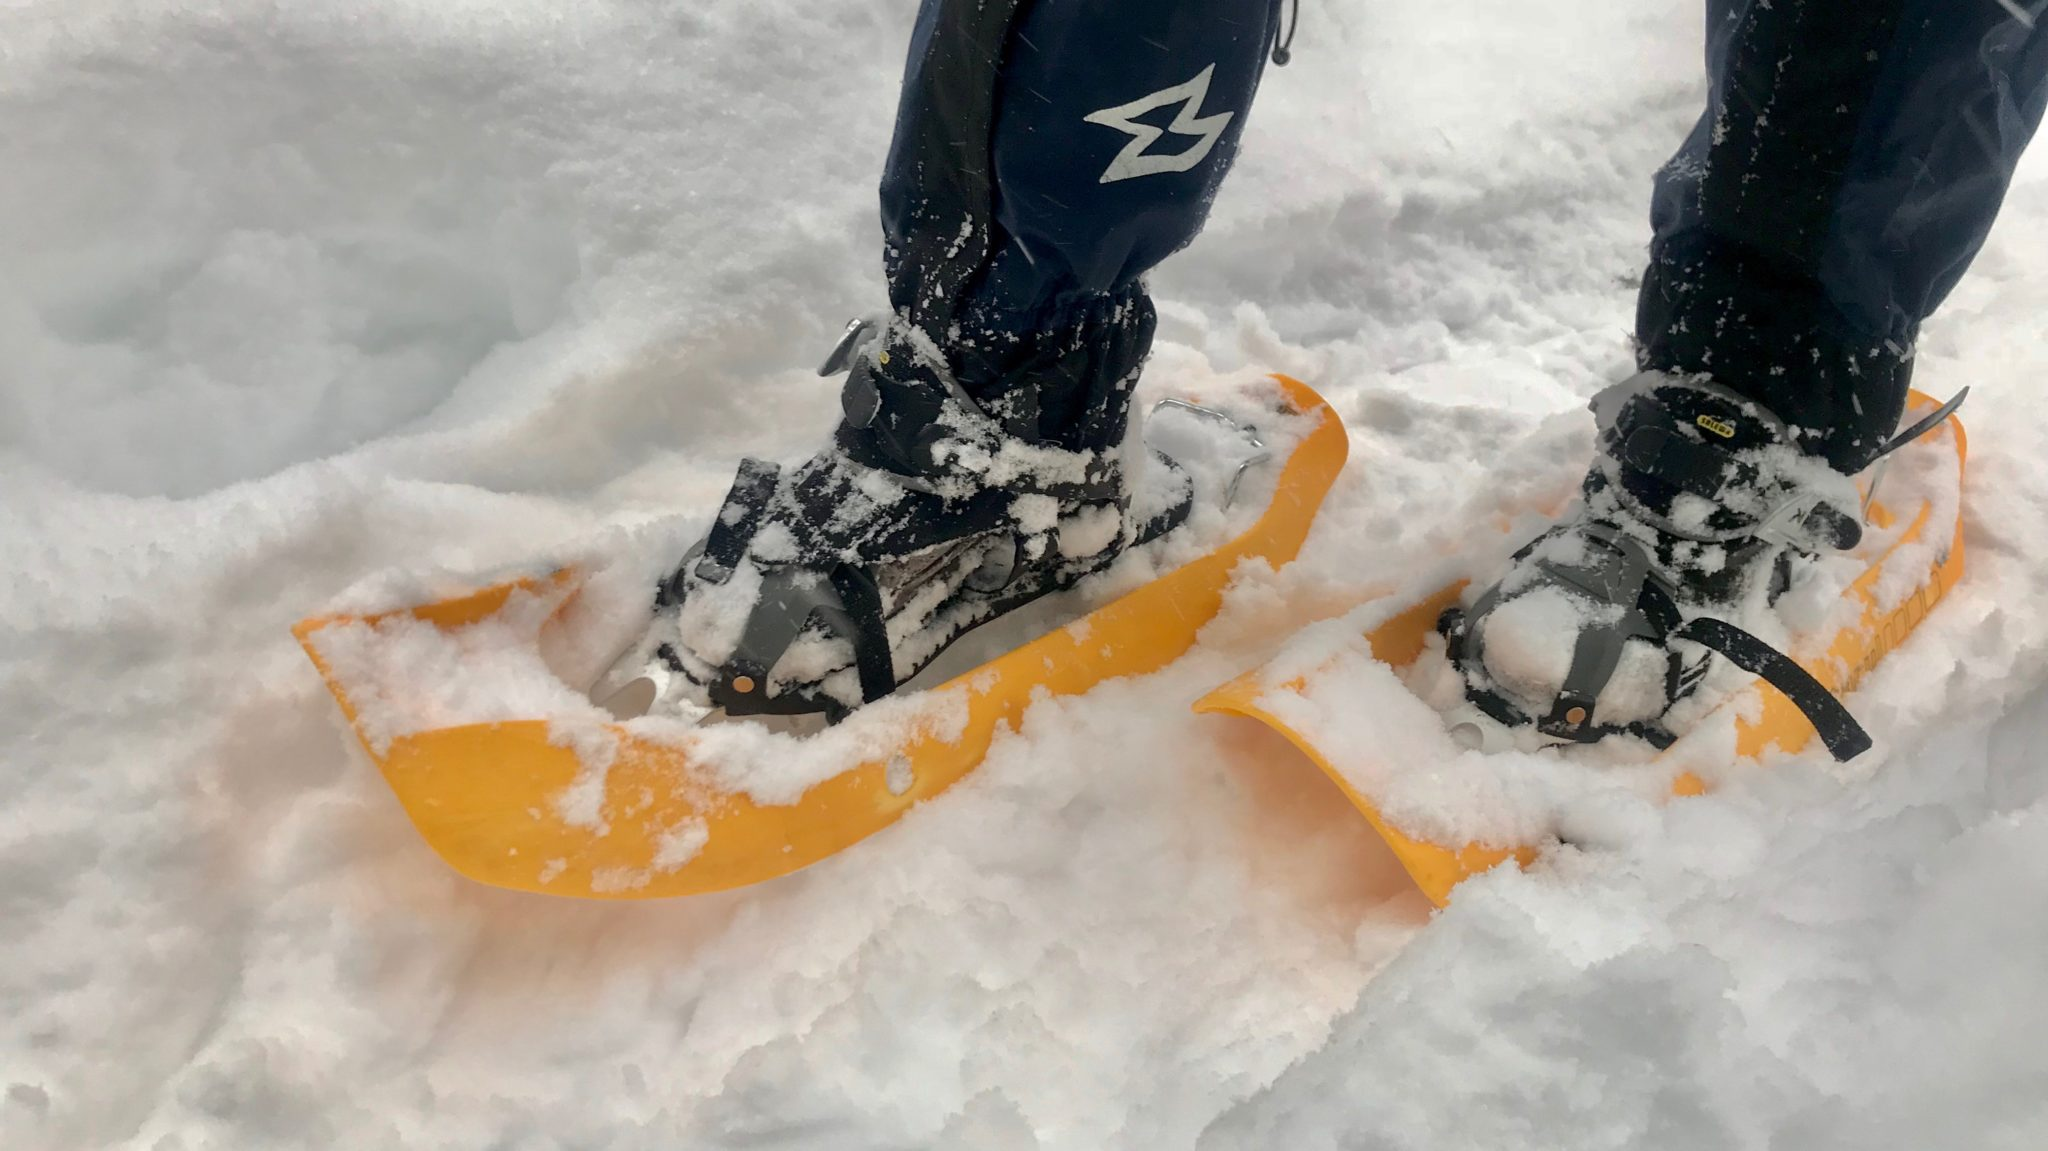 ciaspole - racchette da neve